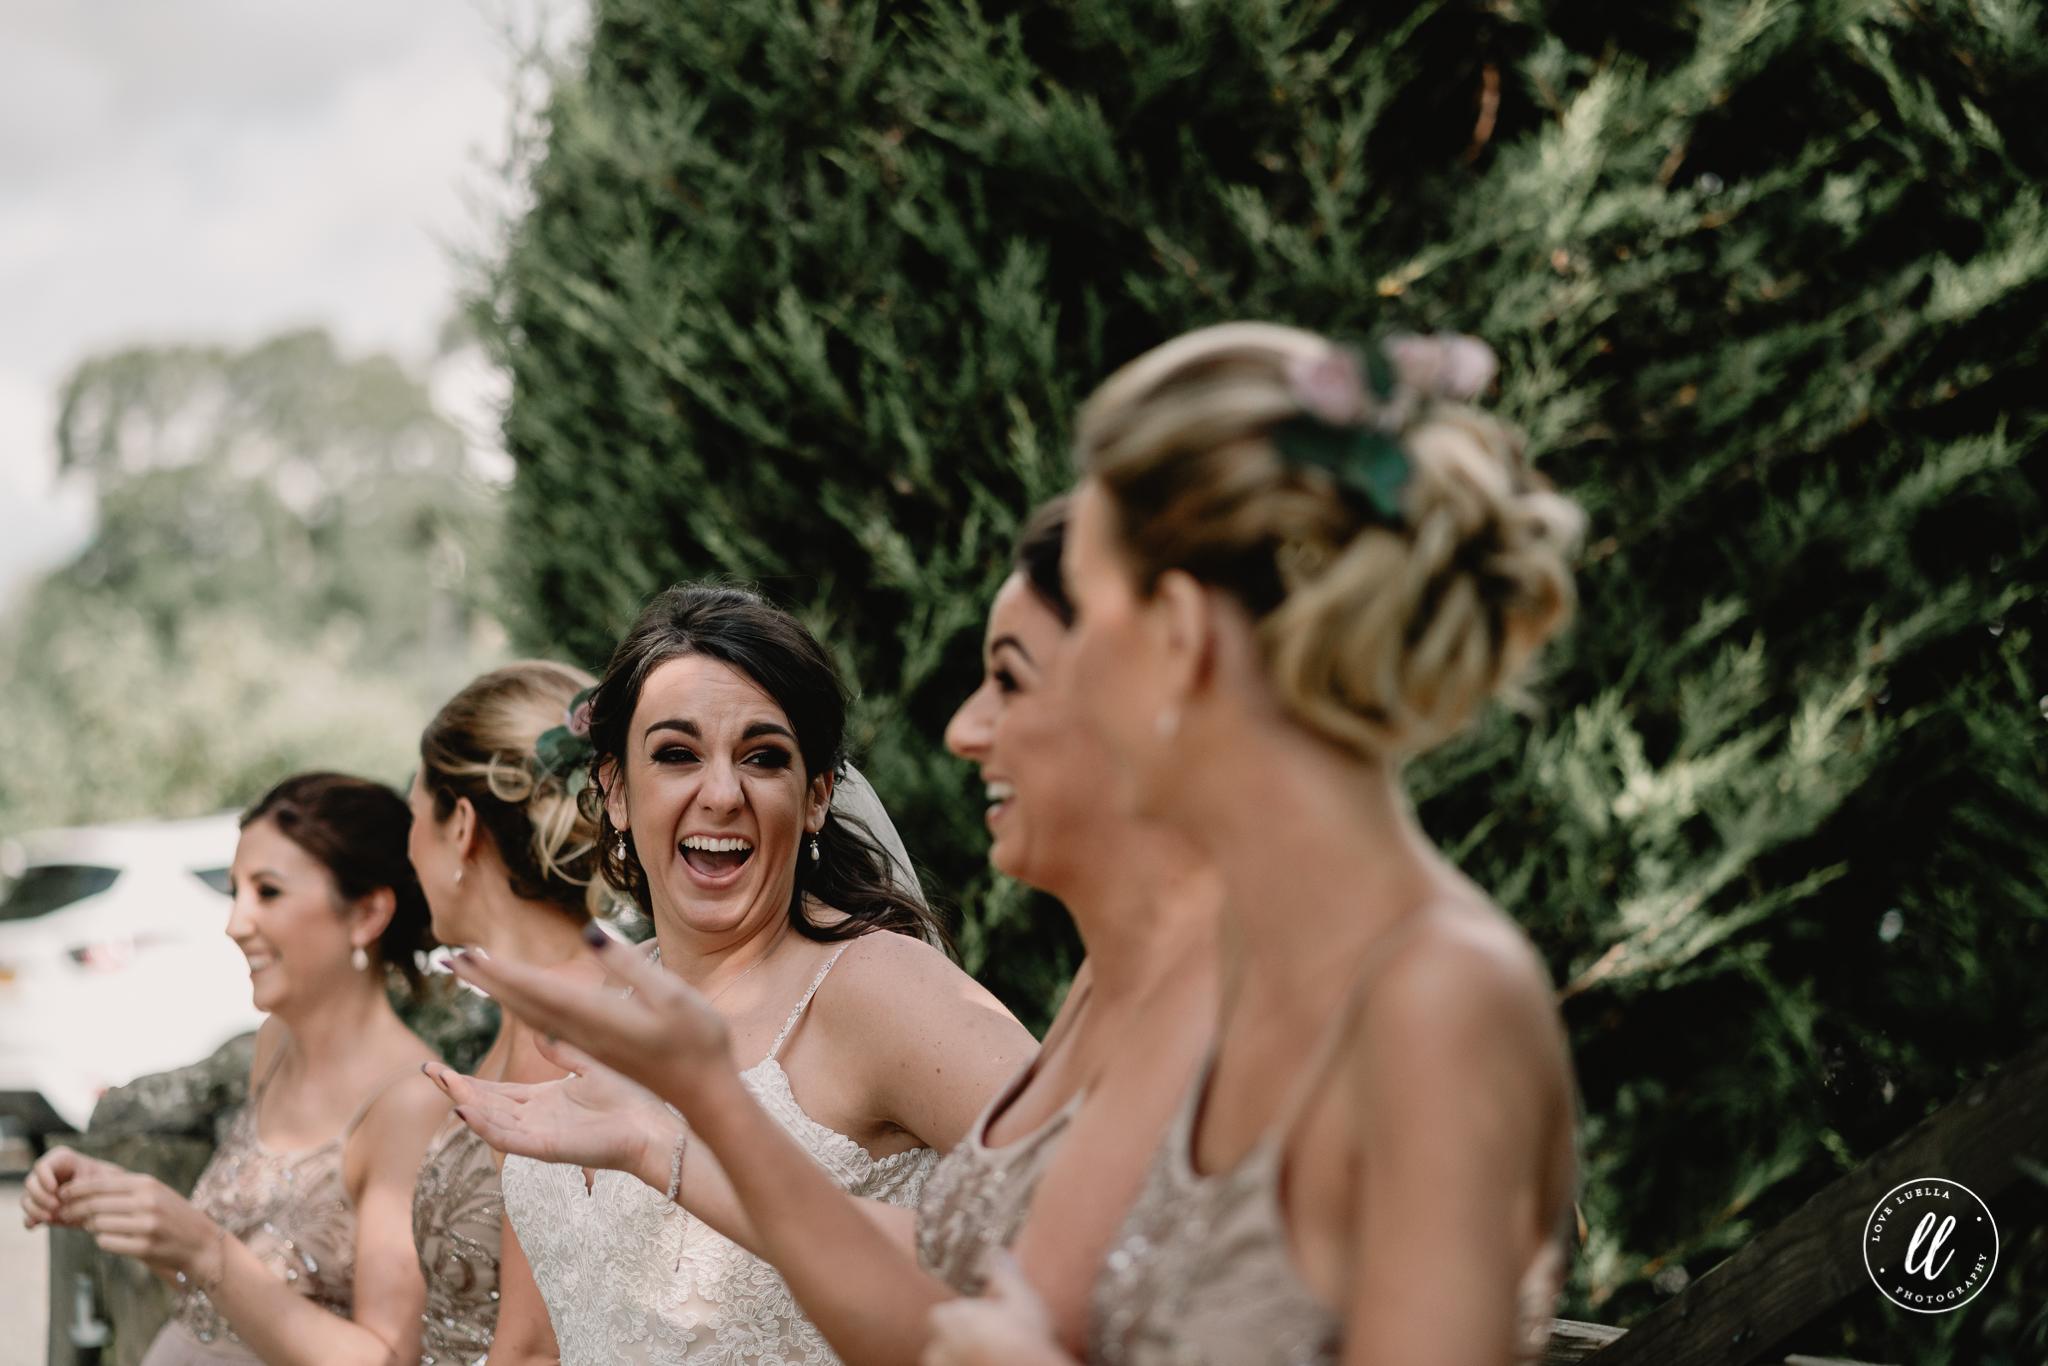 Fun Wedding Photography Cheshire - Wilmslow-1.jpg